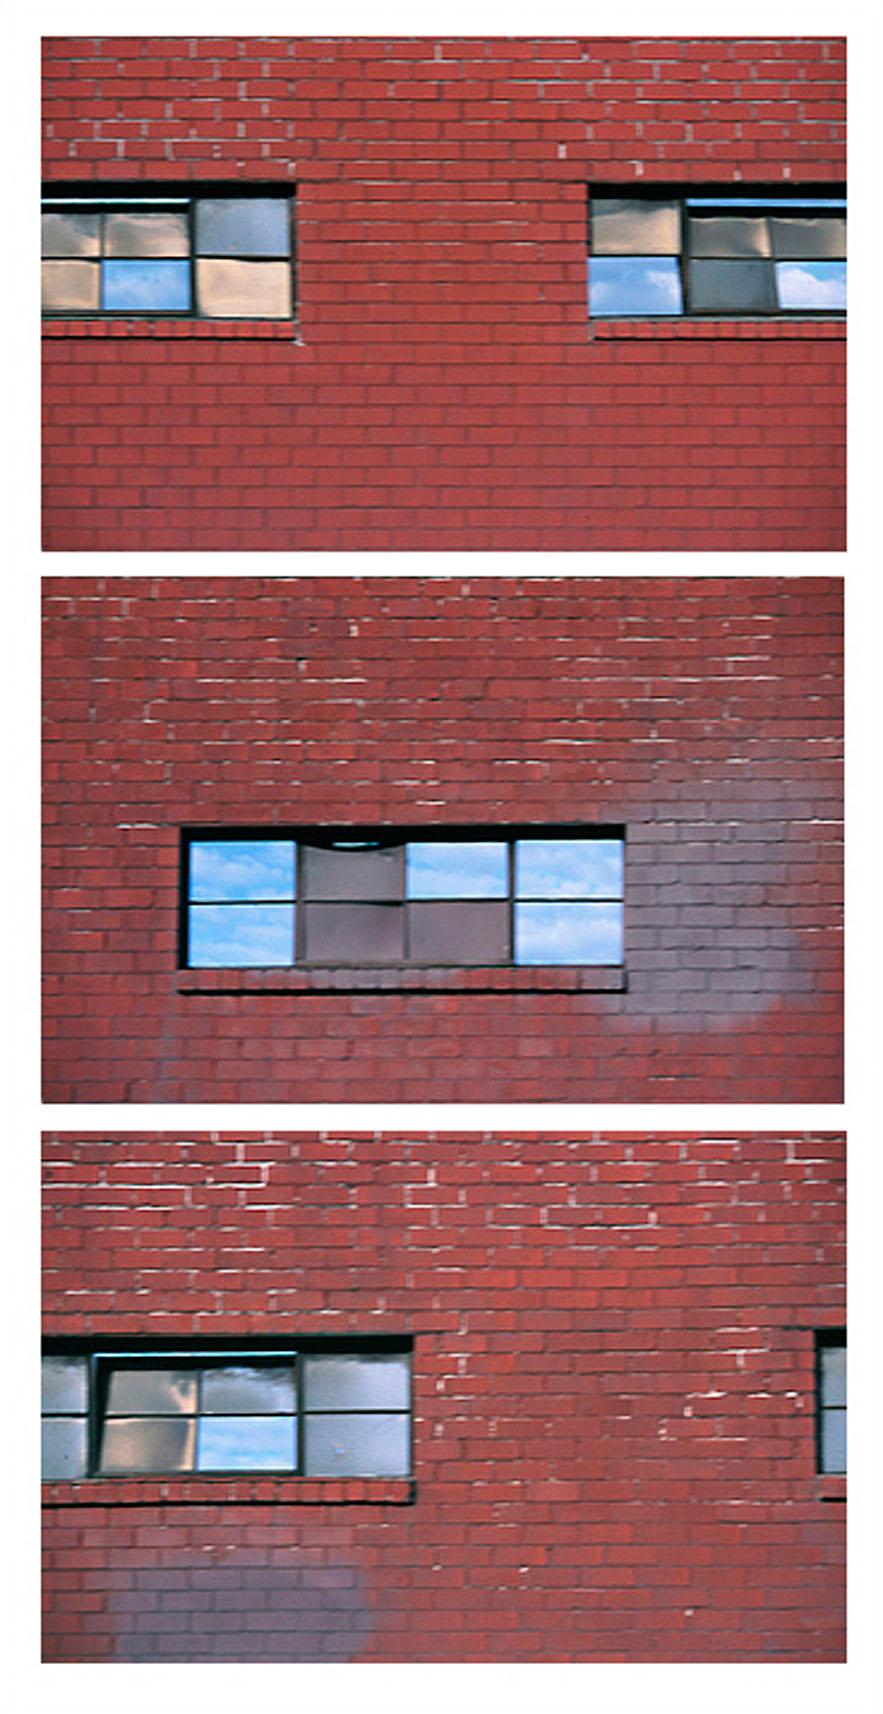 Freeway Wall, I-880 N., Oakland, CA